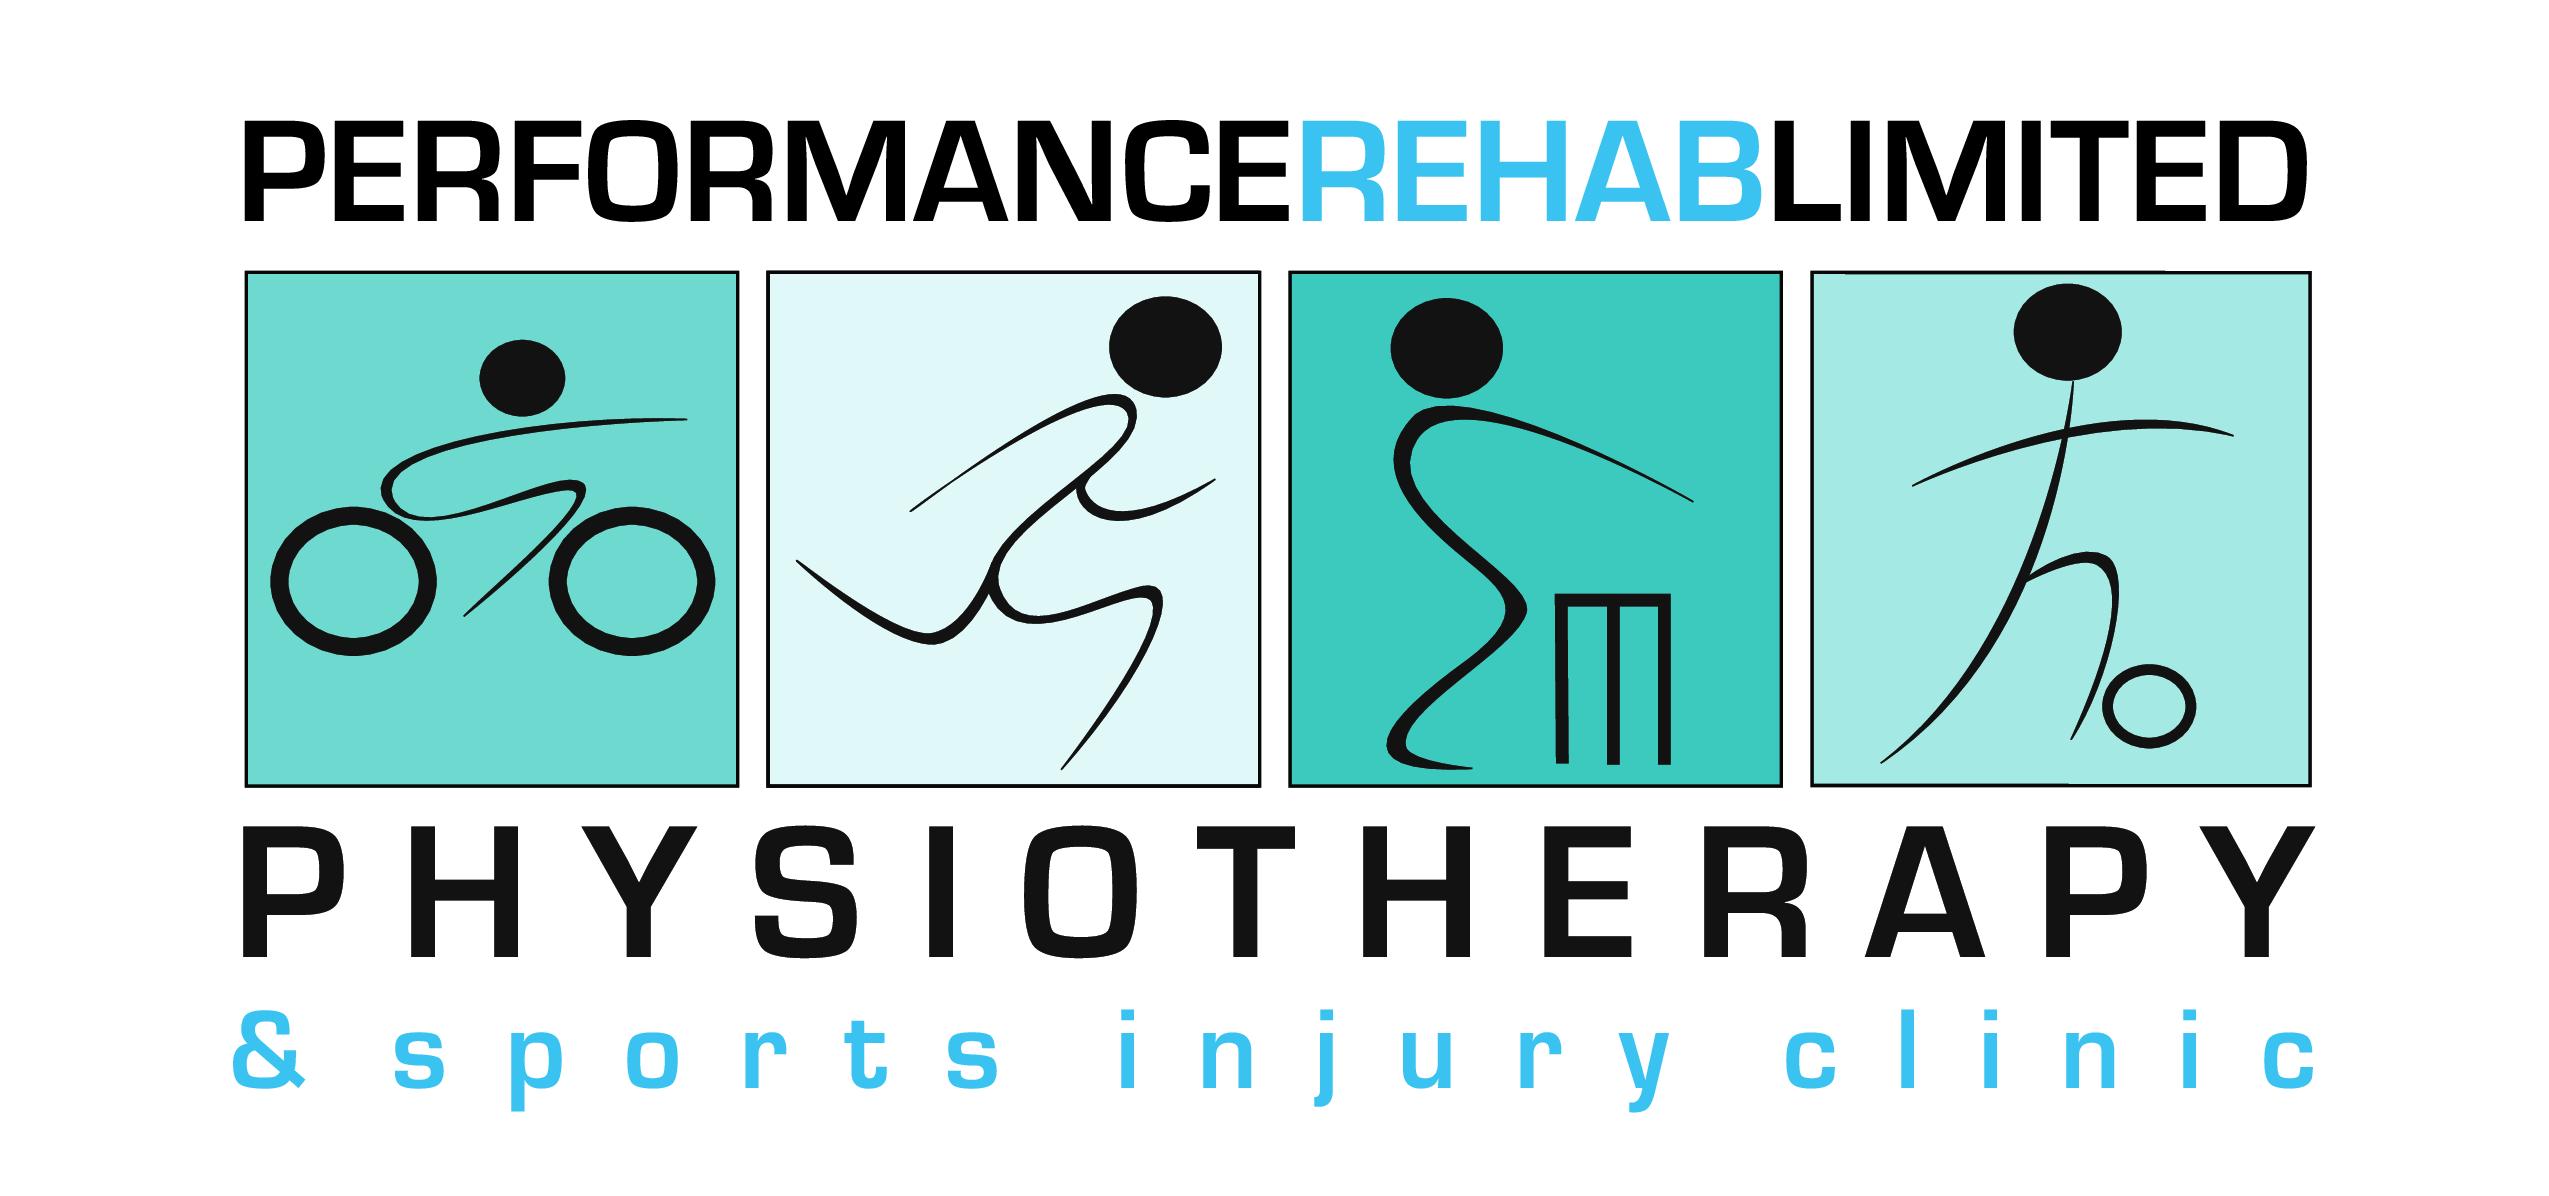 performance rehab